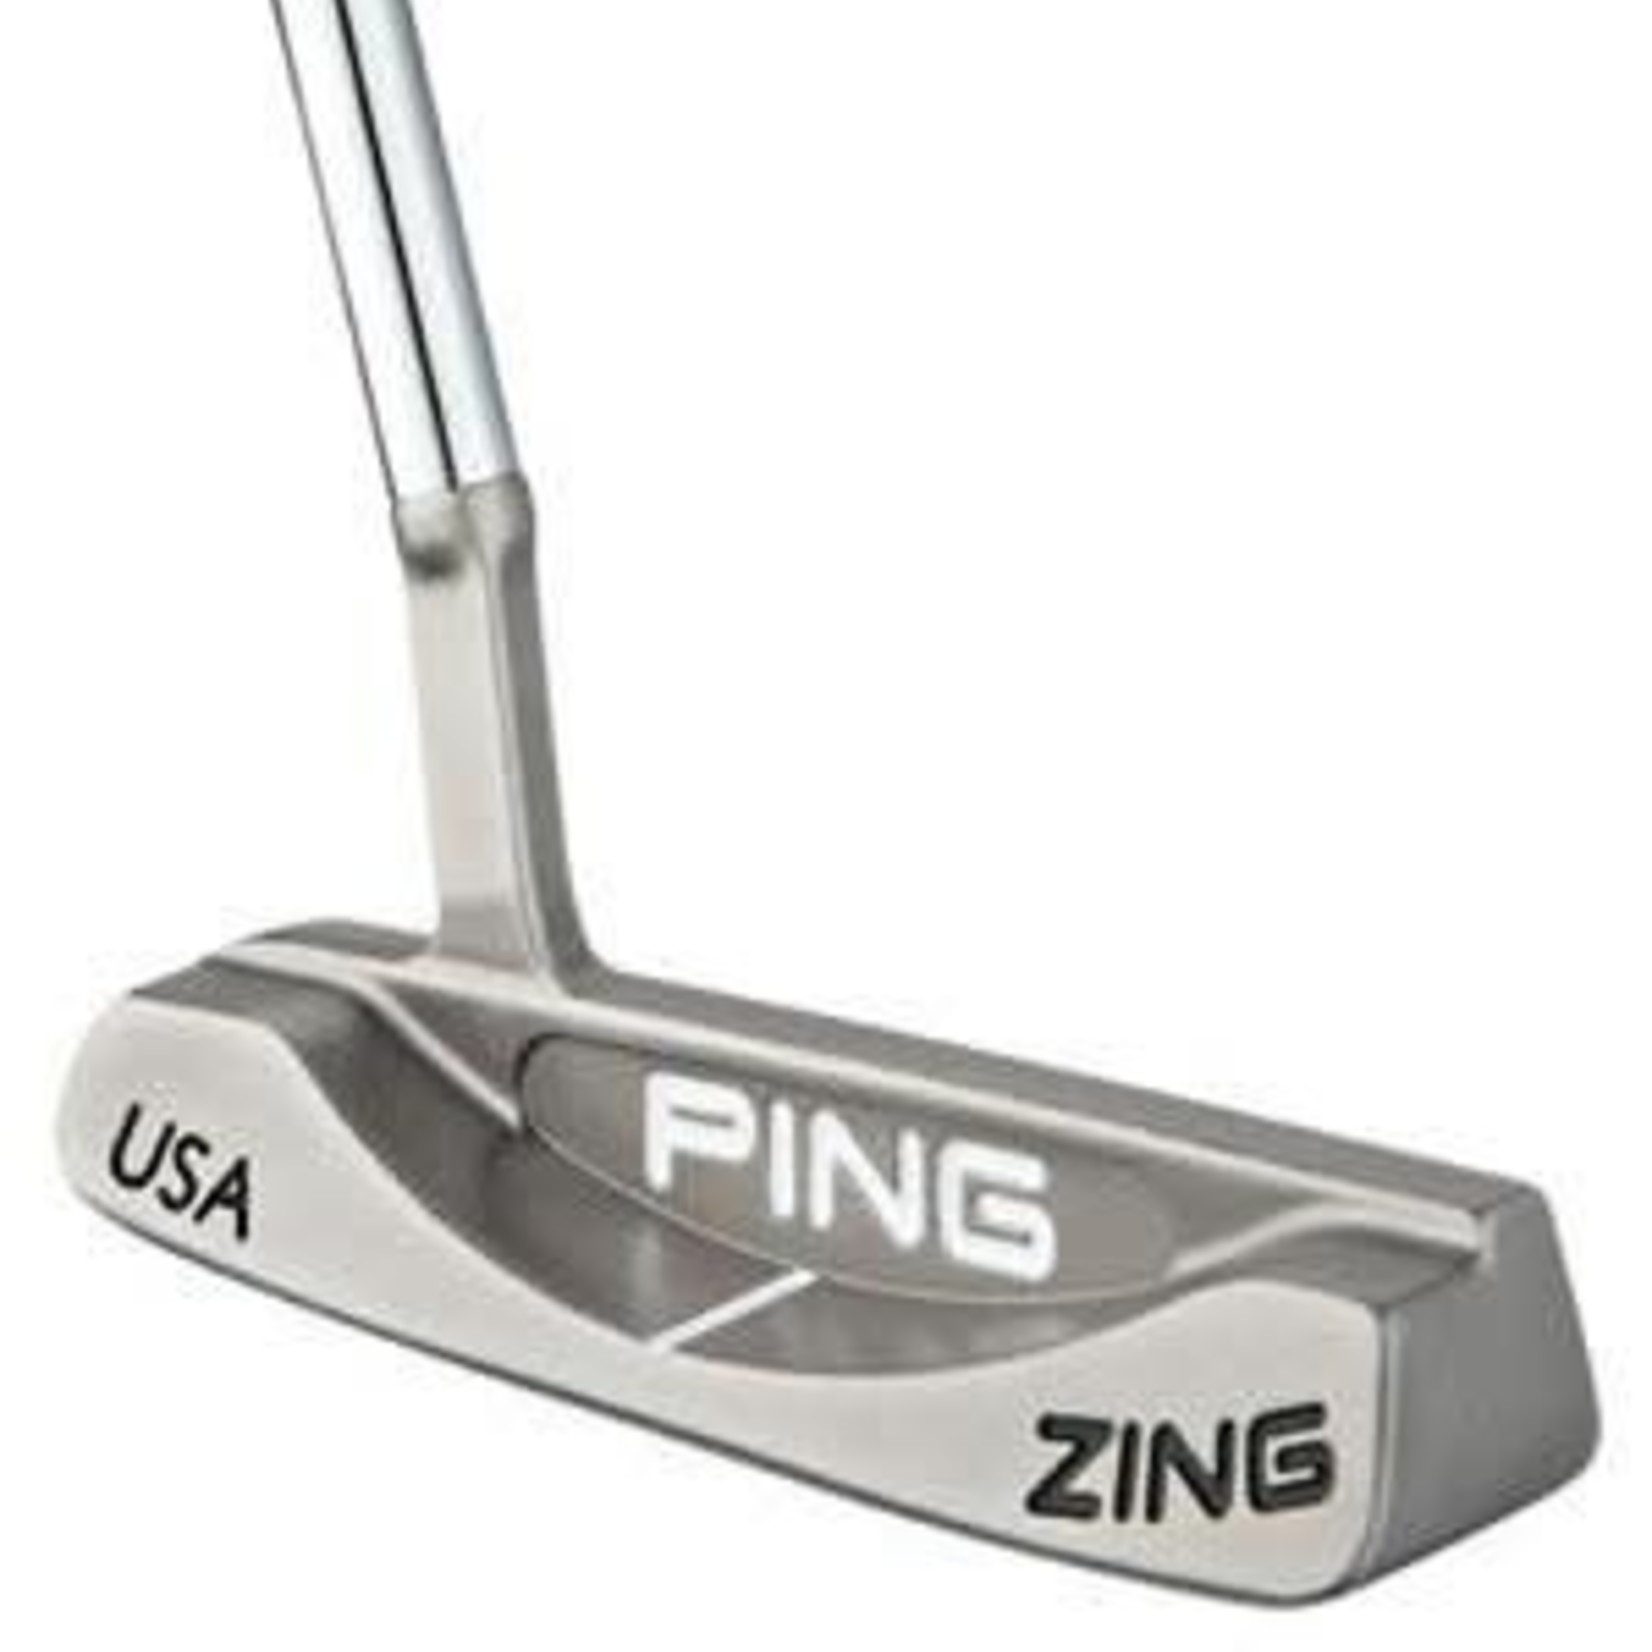 PING PING ZING CLASSIC PUTTER RH